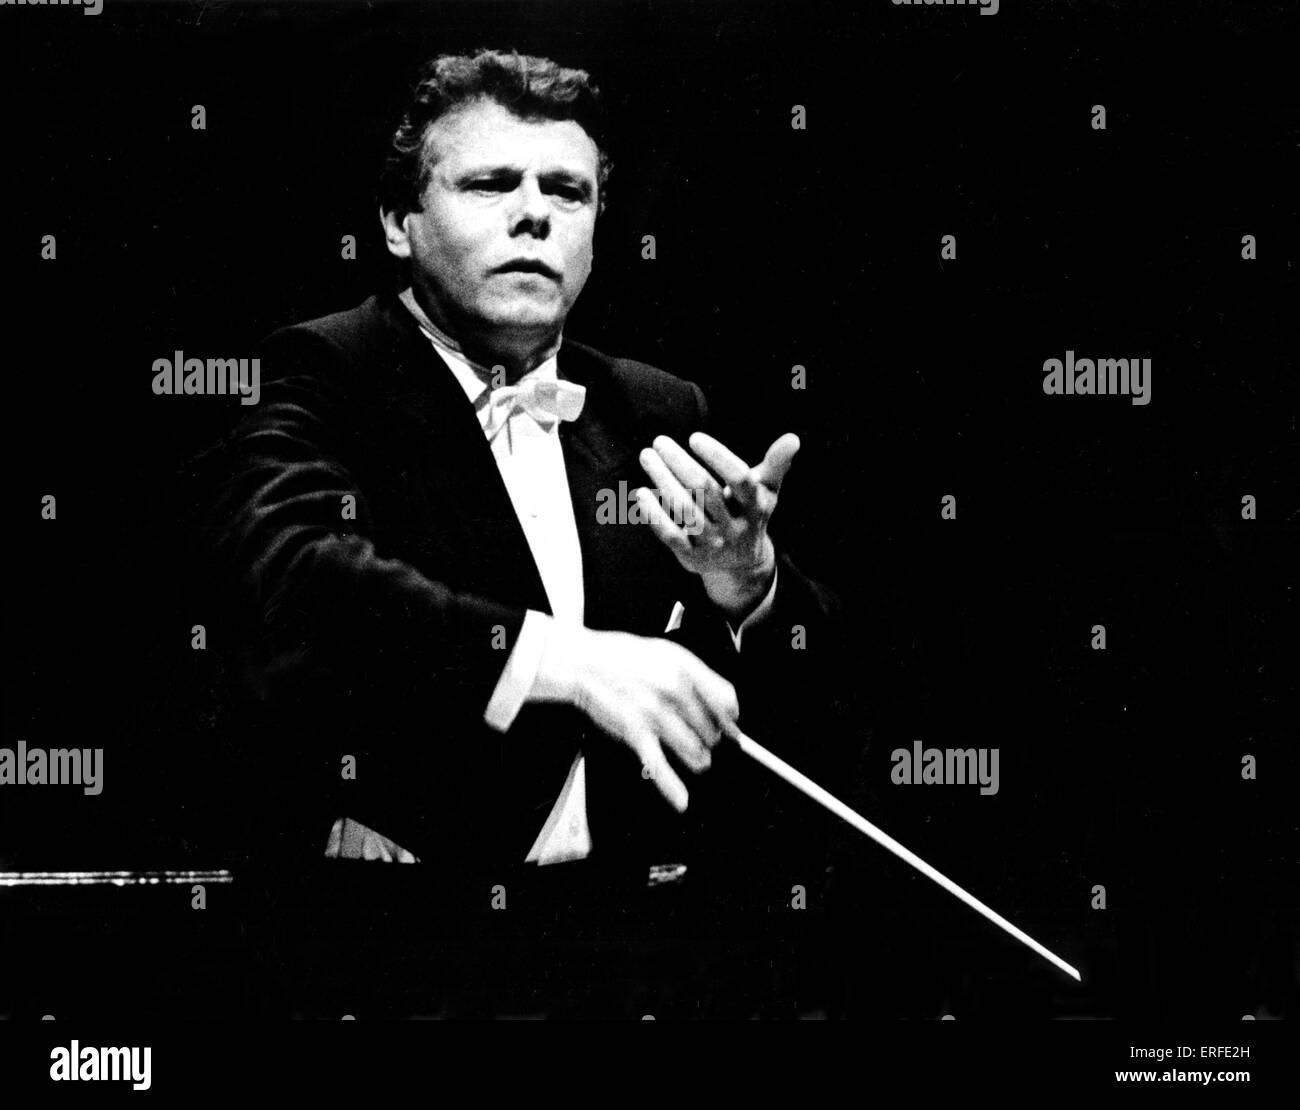 Mariss Jansons conducting, 1995.  Latvian-born conductor, b. 14 January 1943. by Wladimir Polak - Stock Image